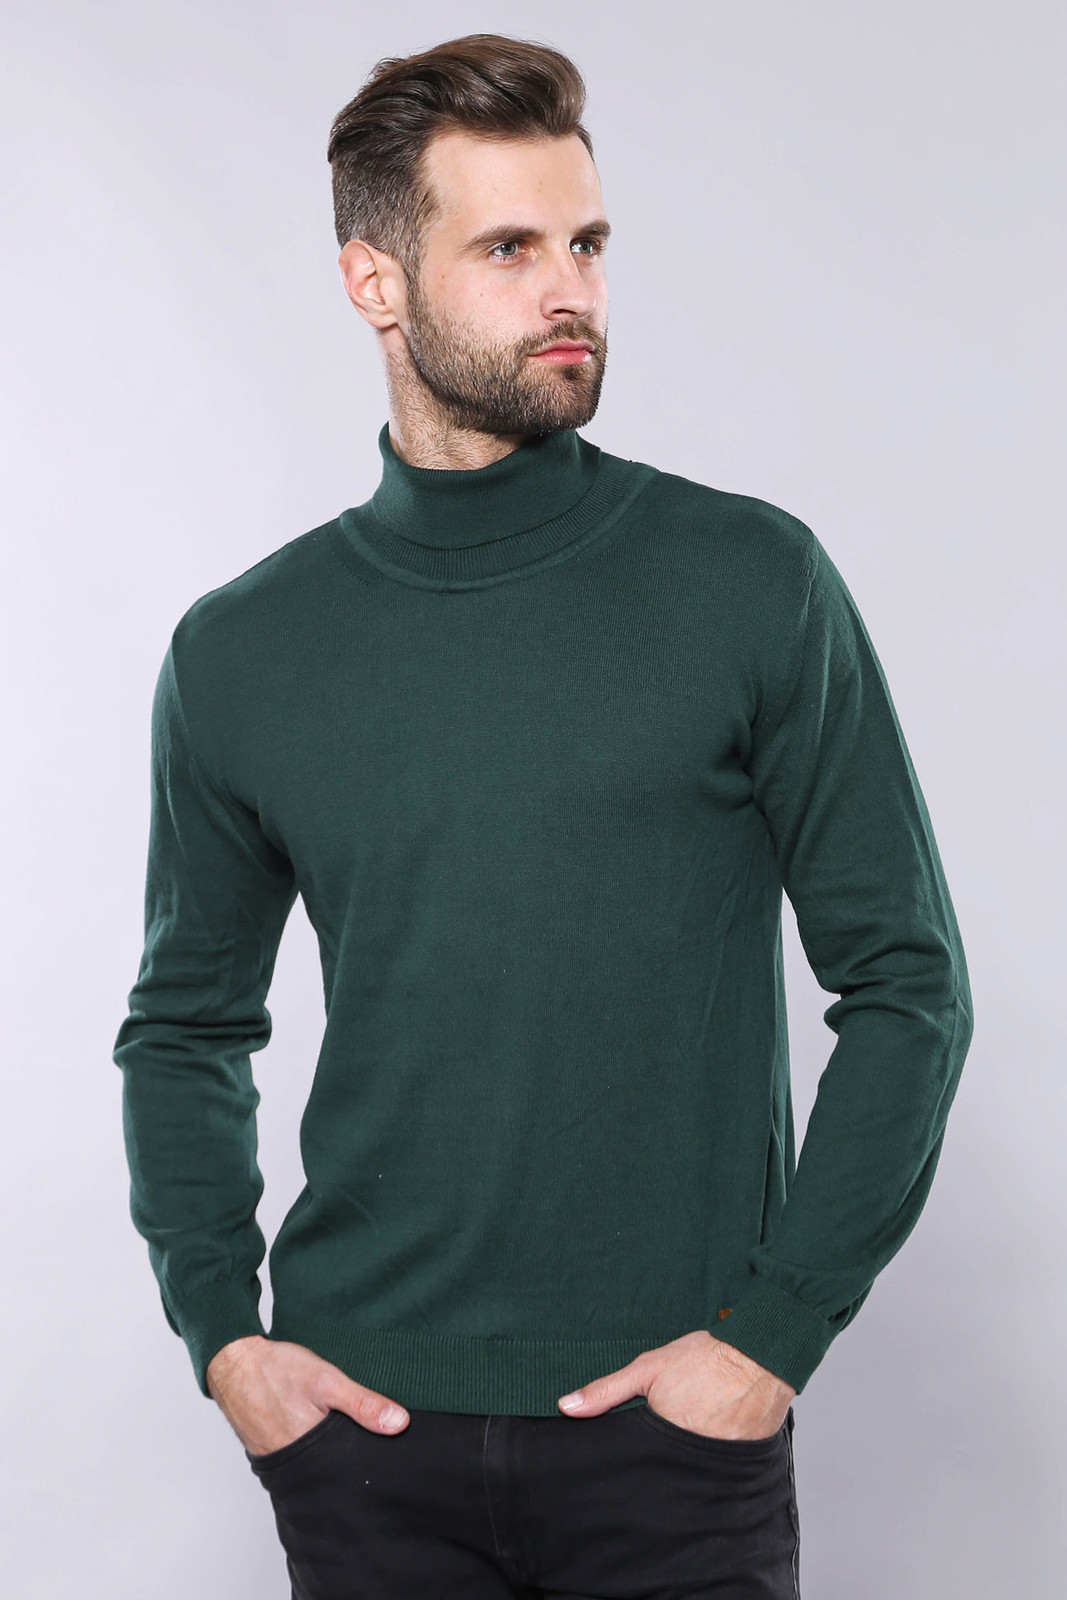 Men's Turtleneck Green Tricot Sweater